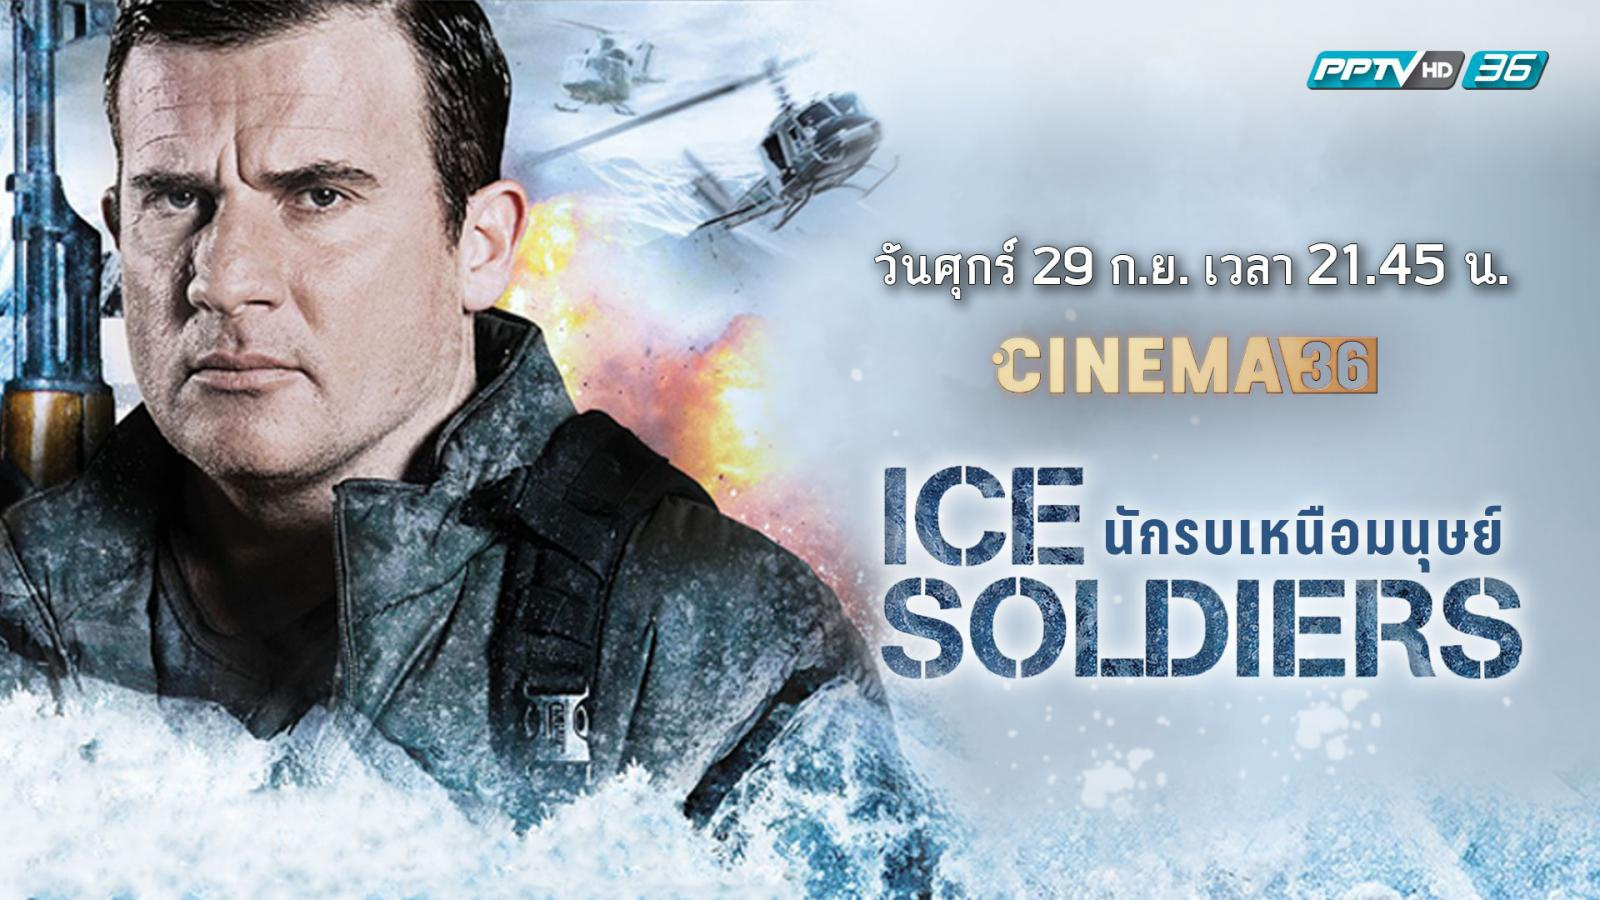 ICE SOLDIERS นักรบเหนือมนุษย์